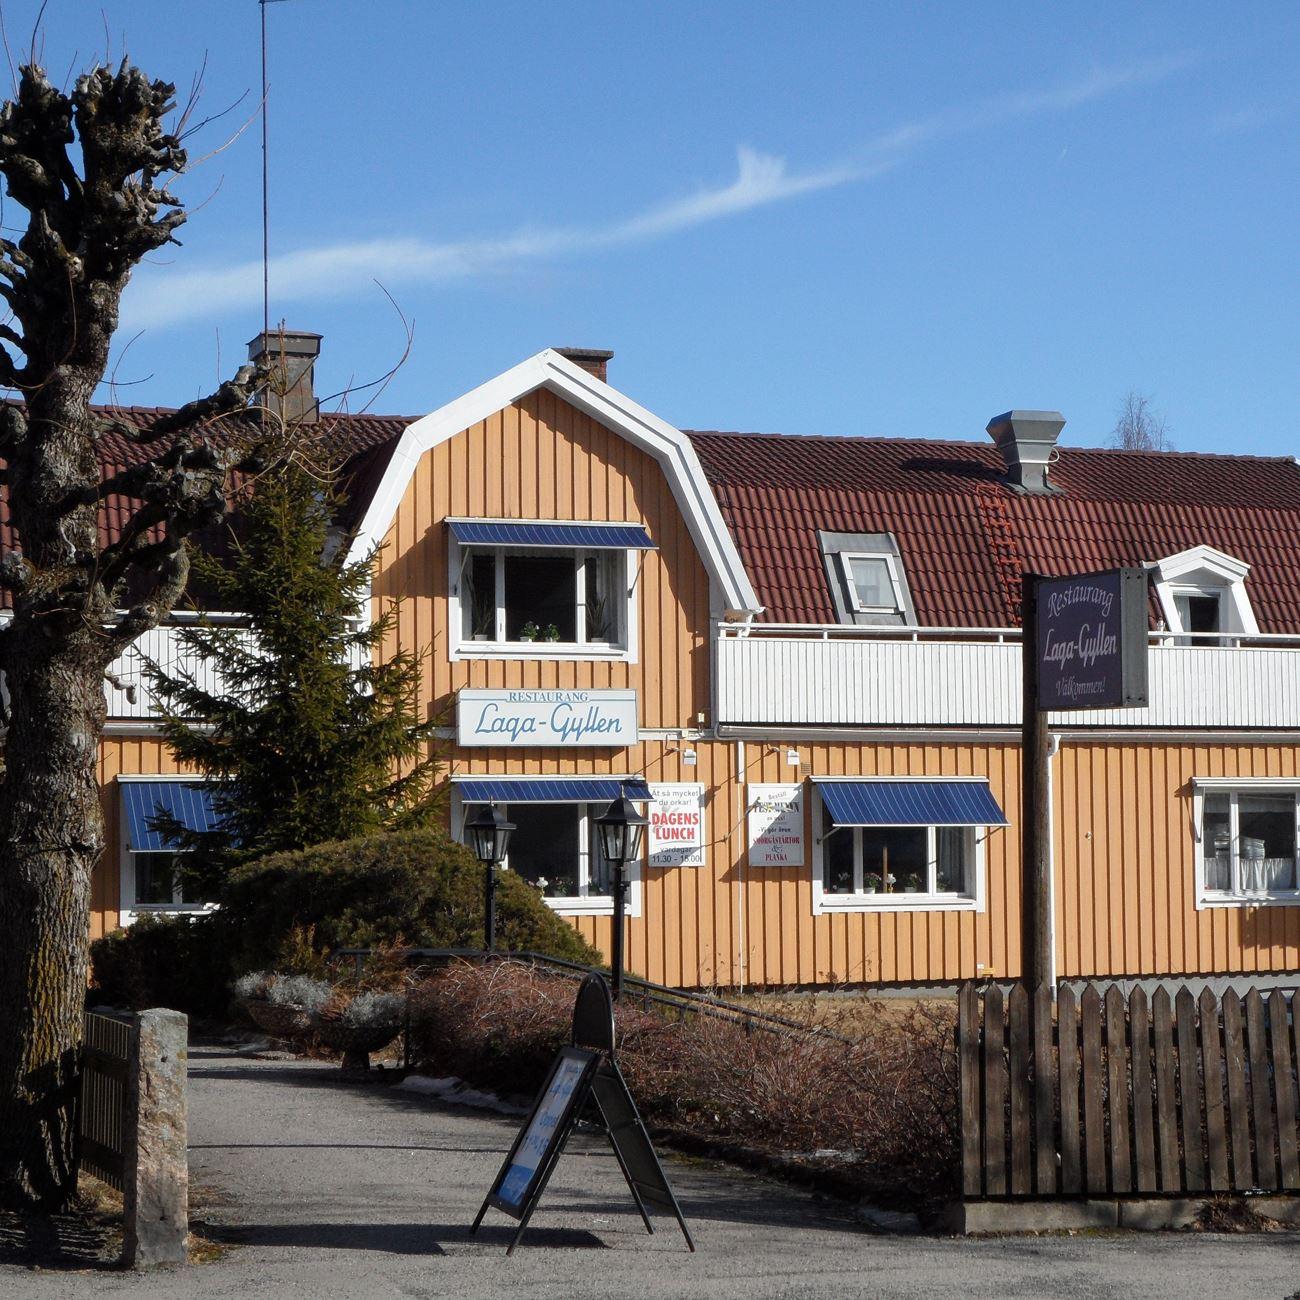 Restaurant Laga-Gyllen